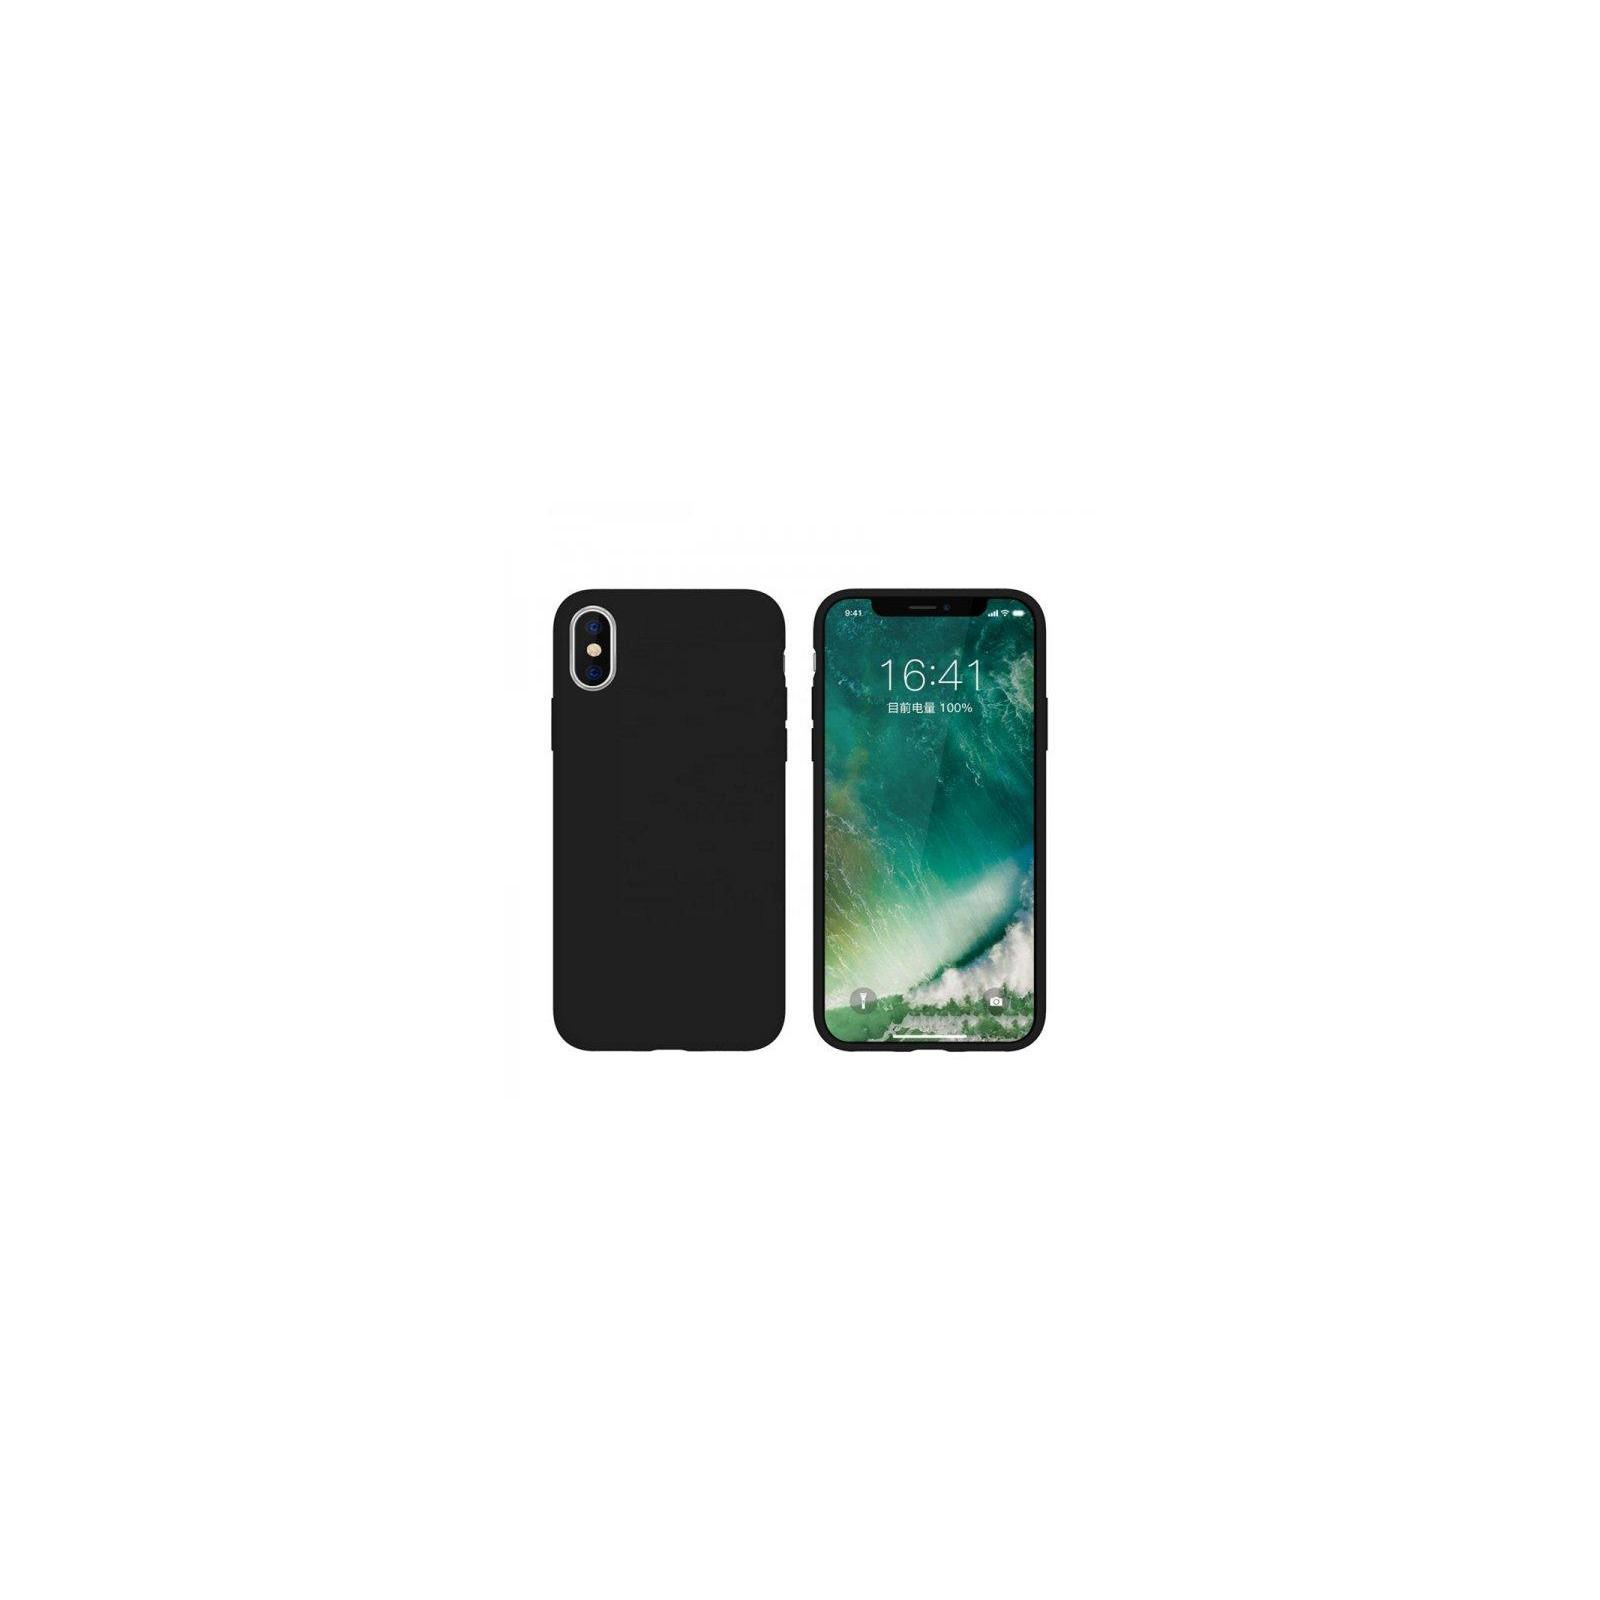 Чохол до моб. телефона 2E Basic Samsung Galaxy A31, Soft feeling, Black (2E-G-A31-NKSF-BK)